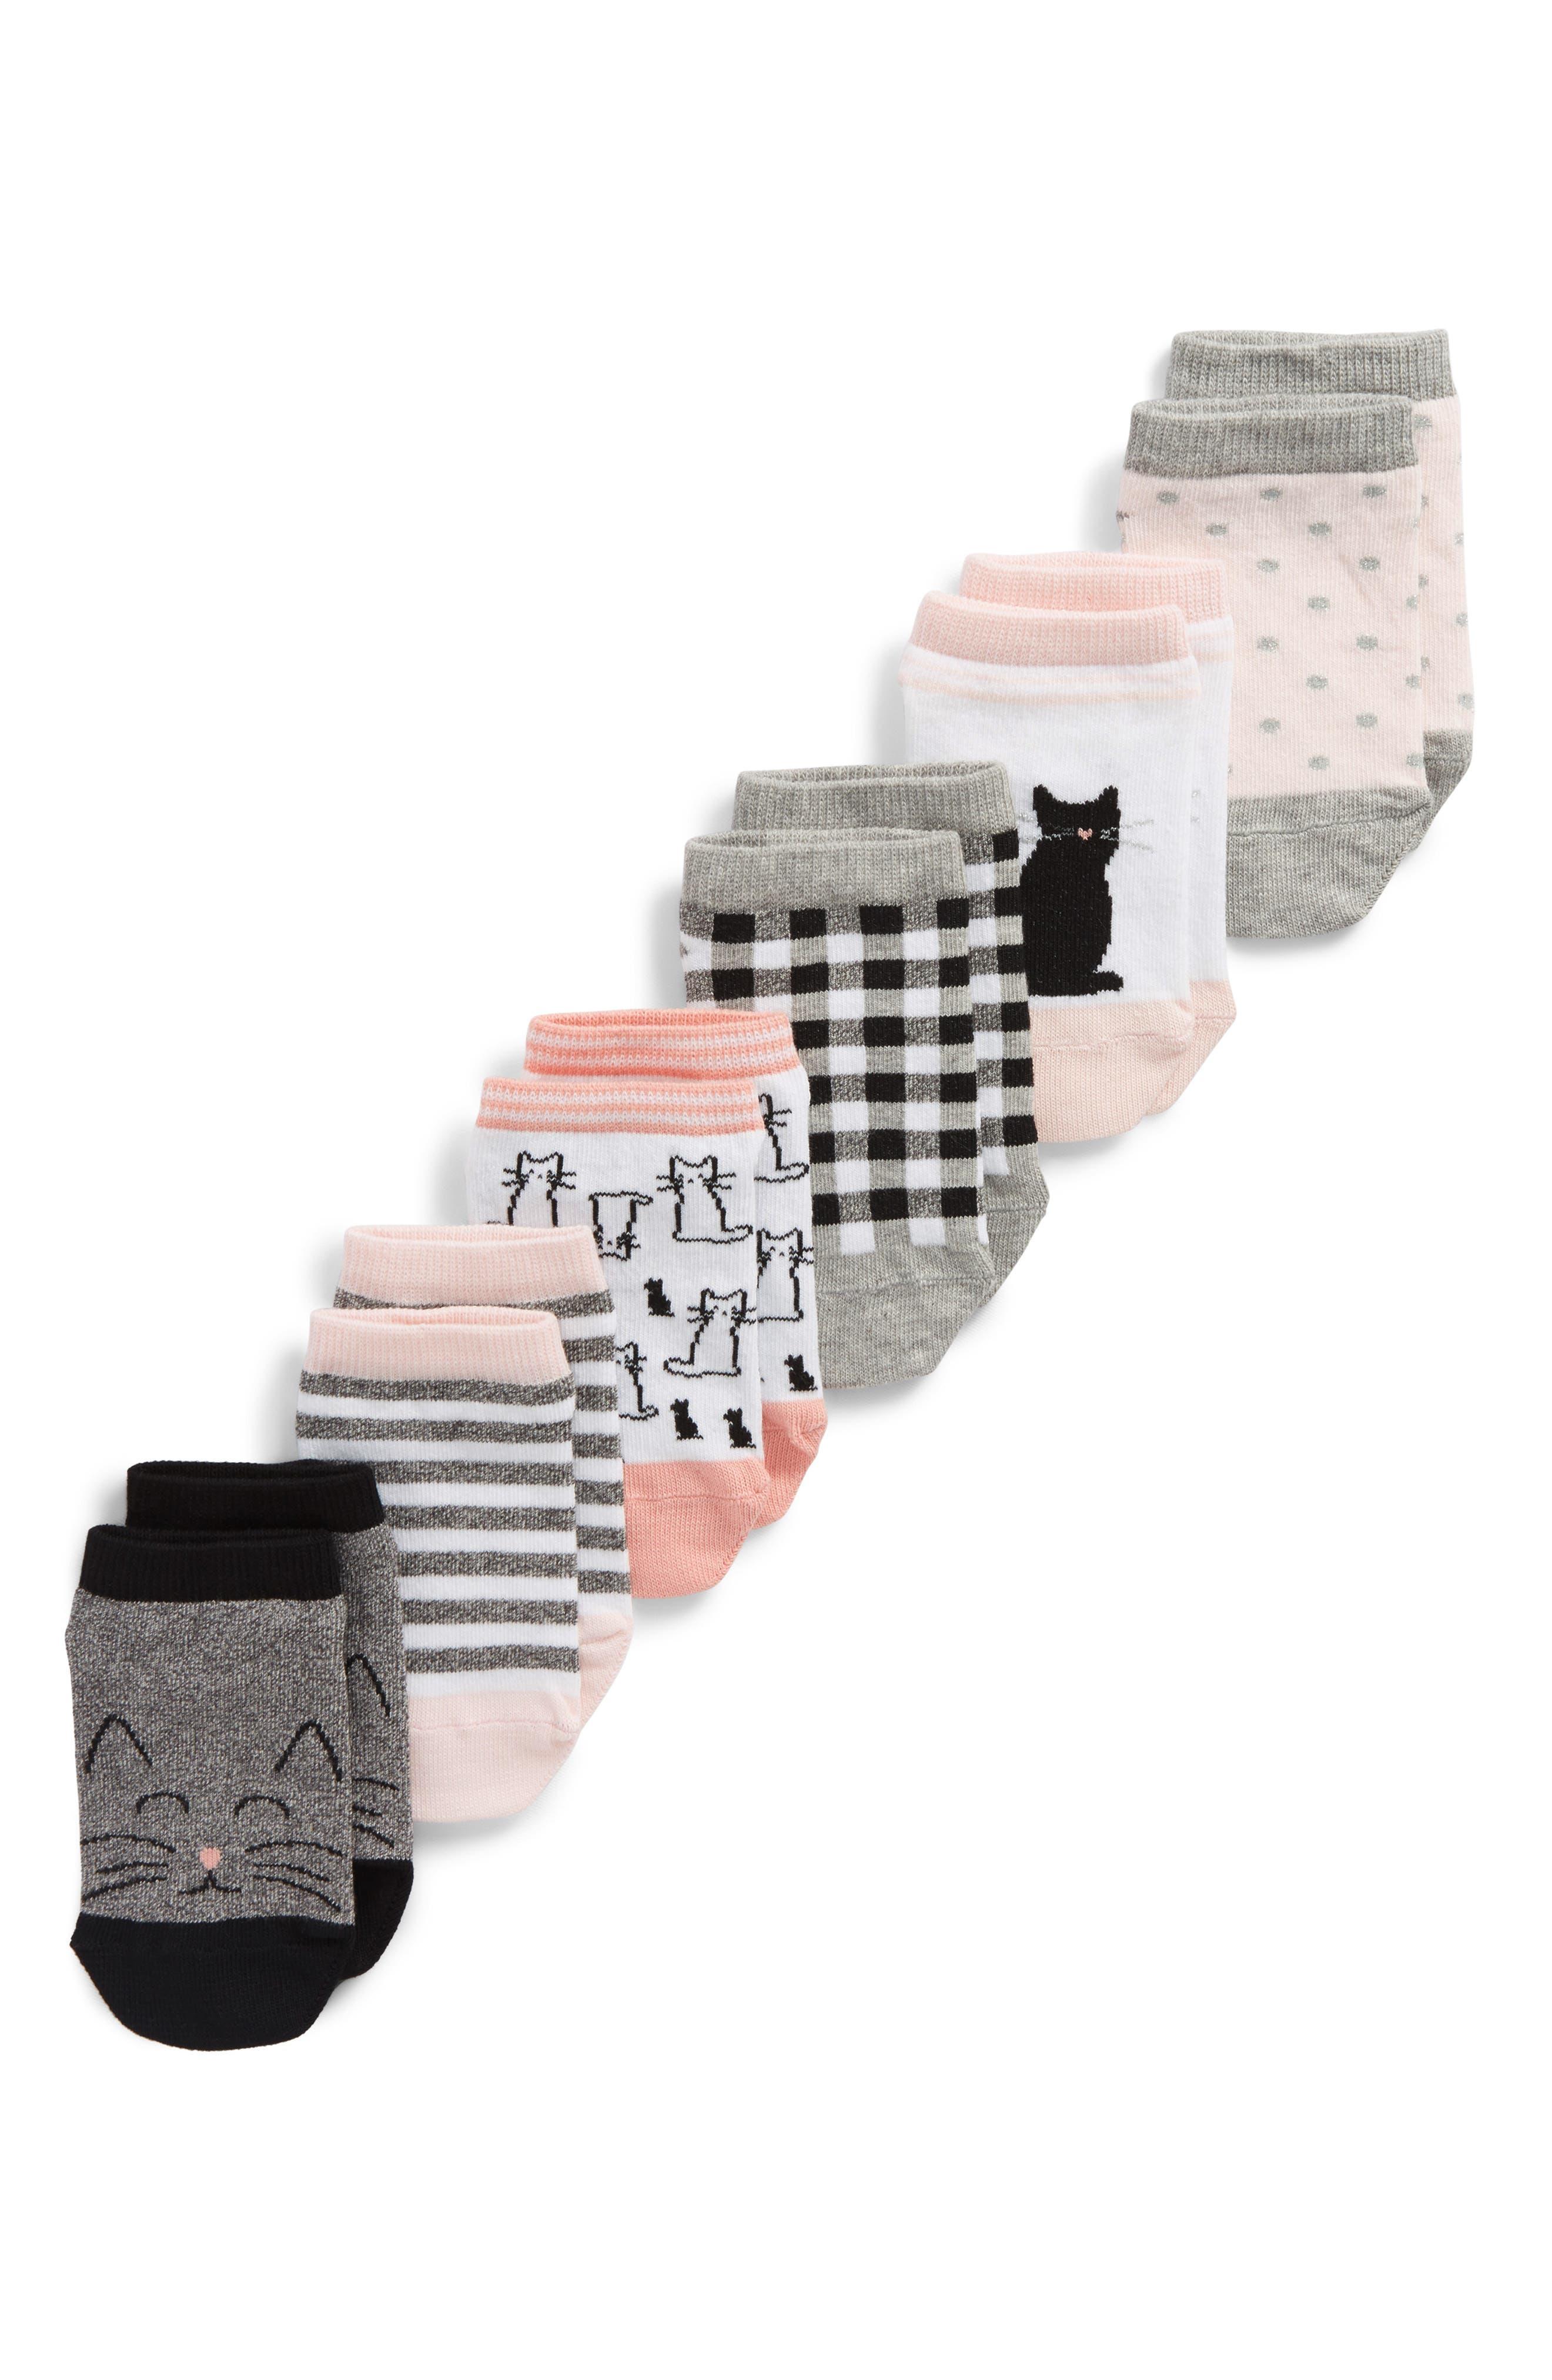 6-Pack Assorted Low Cut Socks,                             Main thumbnail 1, color,                             002